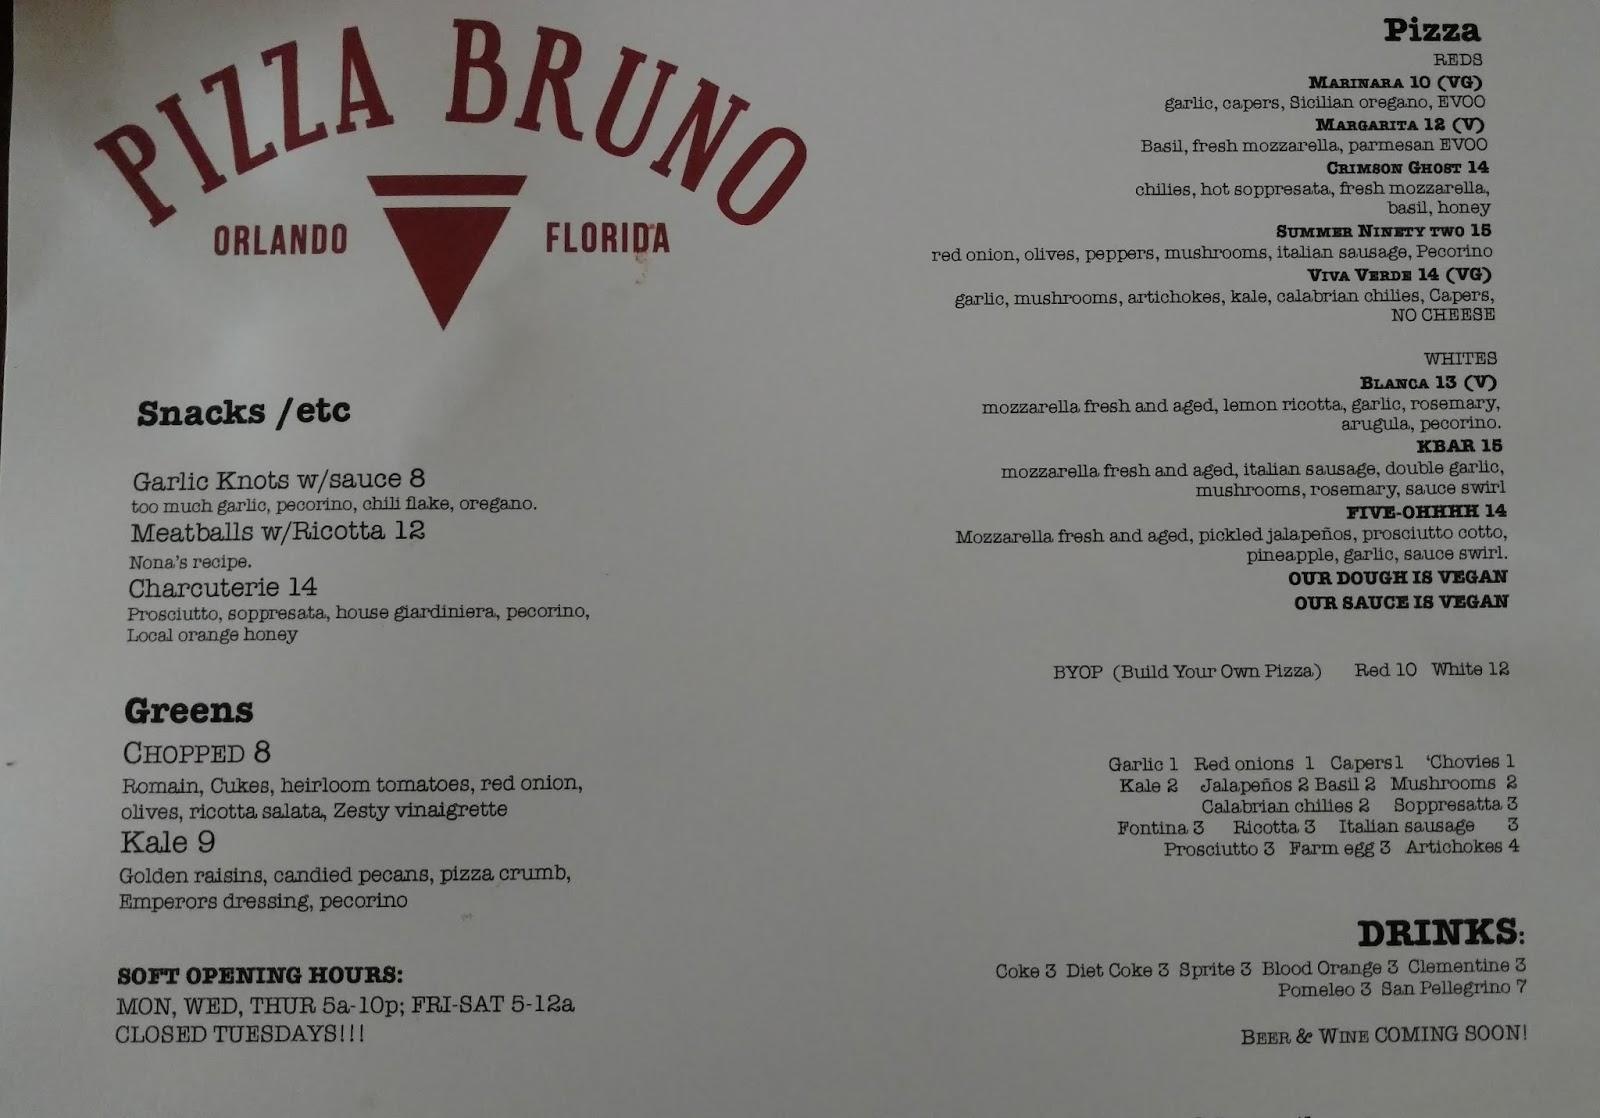 eat local orlando pizza bruno